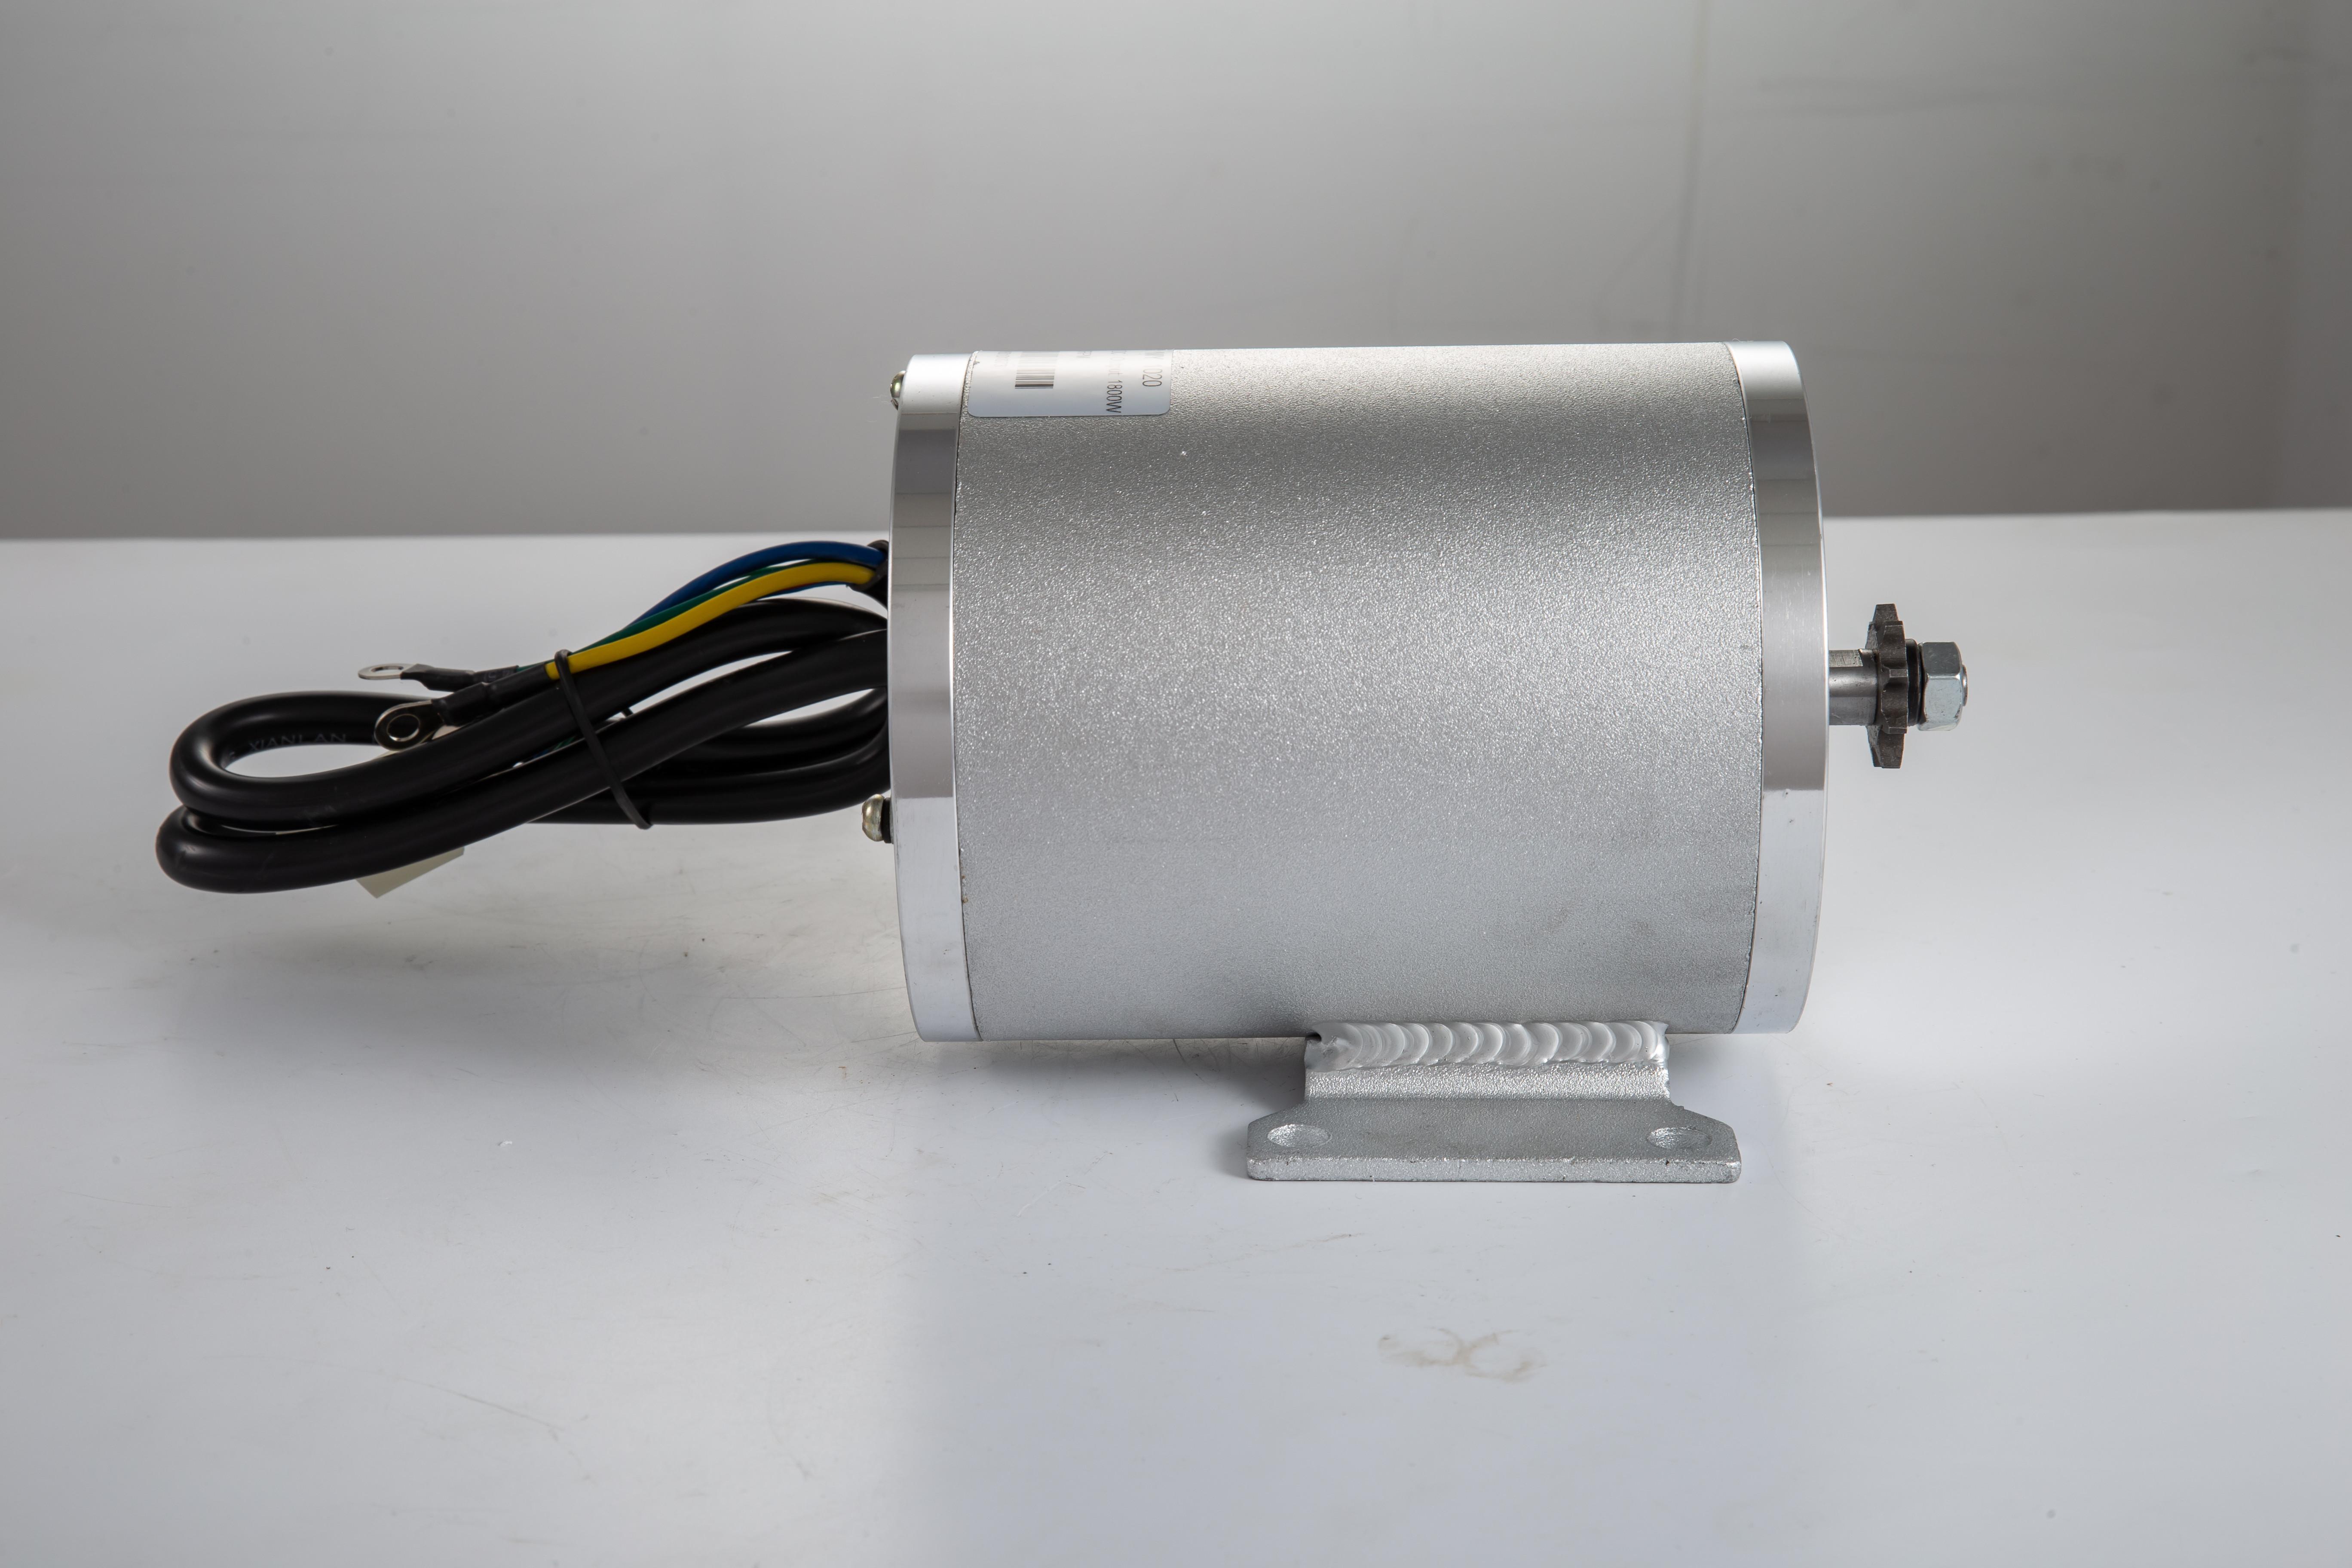 1800W-48V-DC-Brushless-Electric-Motor-Kit-f-Scooter-500-1800W-E-Bike-Go-Kart thumbnail 189